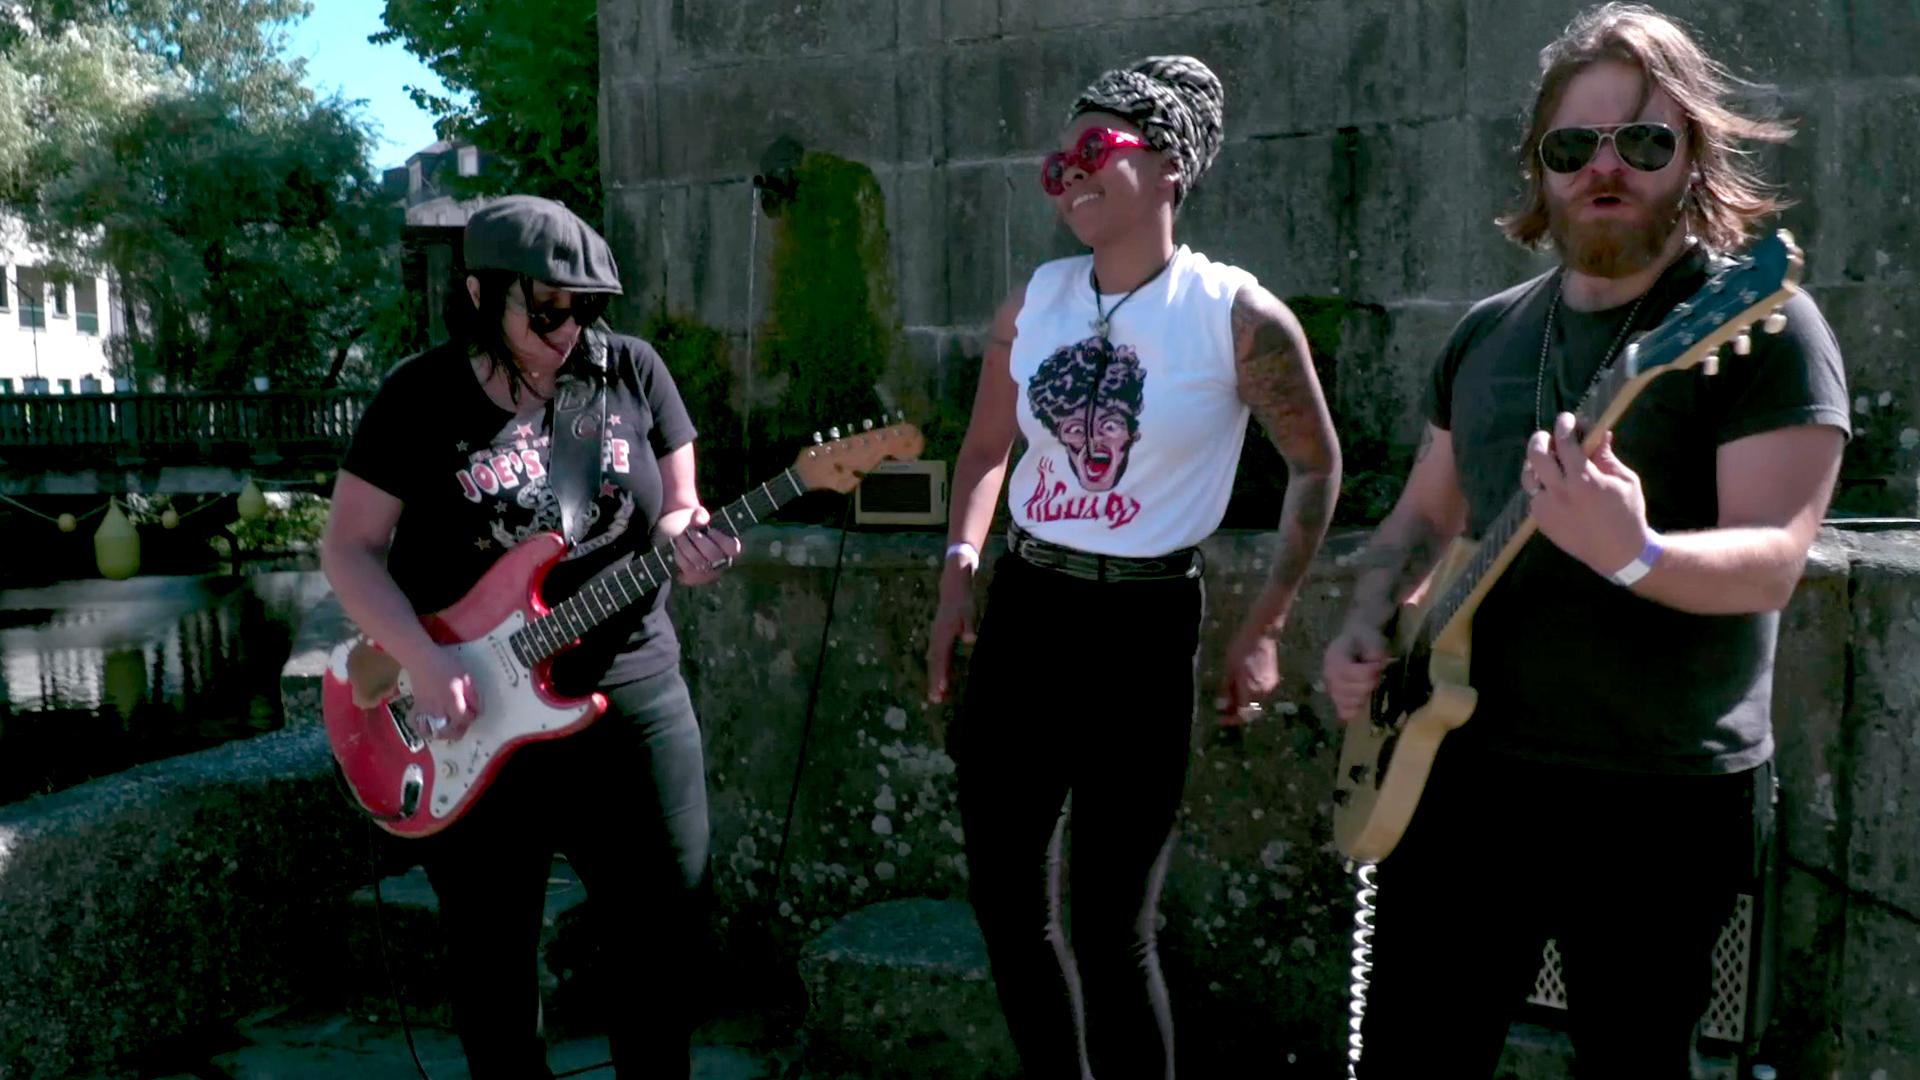 Temporada 2 - Festivales Rías Baixas Nikki Hill - Heavy Hearts Hard Fists | PortAmérica